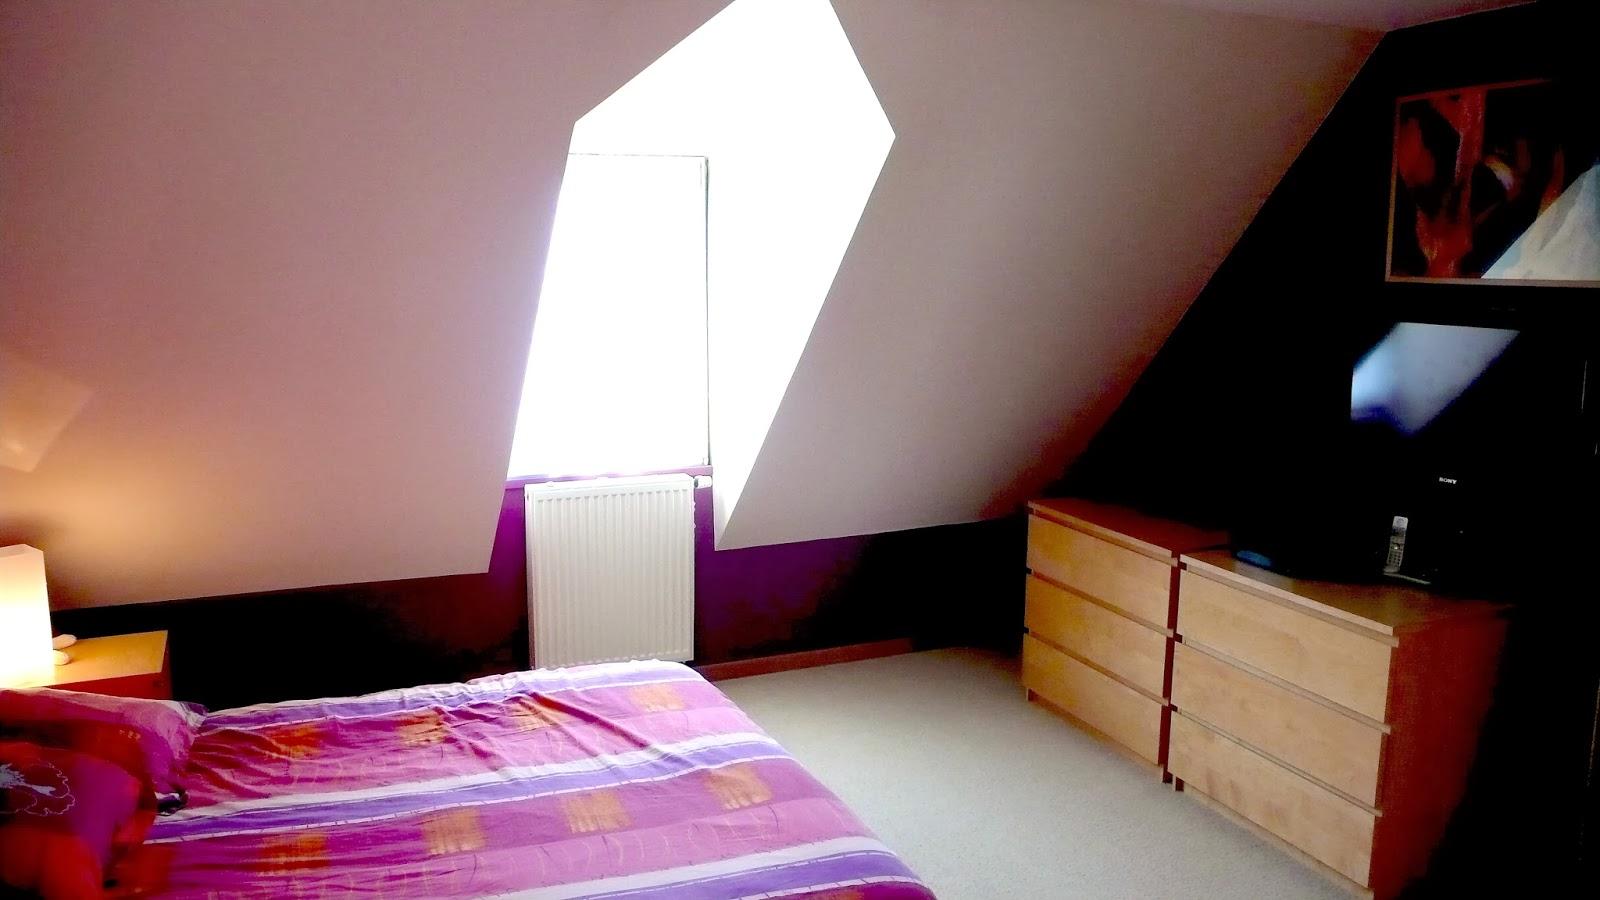 Ma maison sur bischheim la chambre coucher n 1 for Chambre commerciale 13 novembre 2013